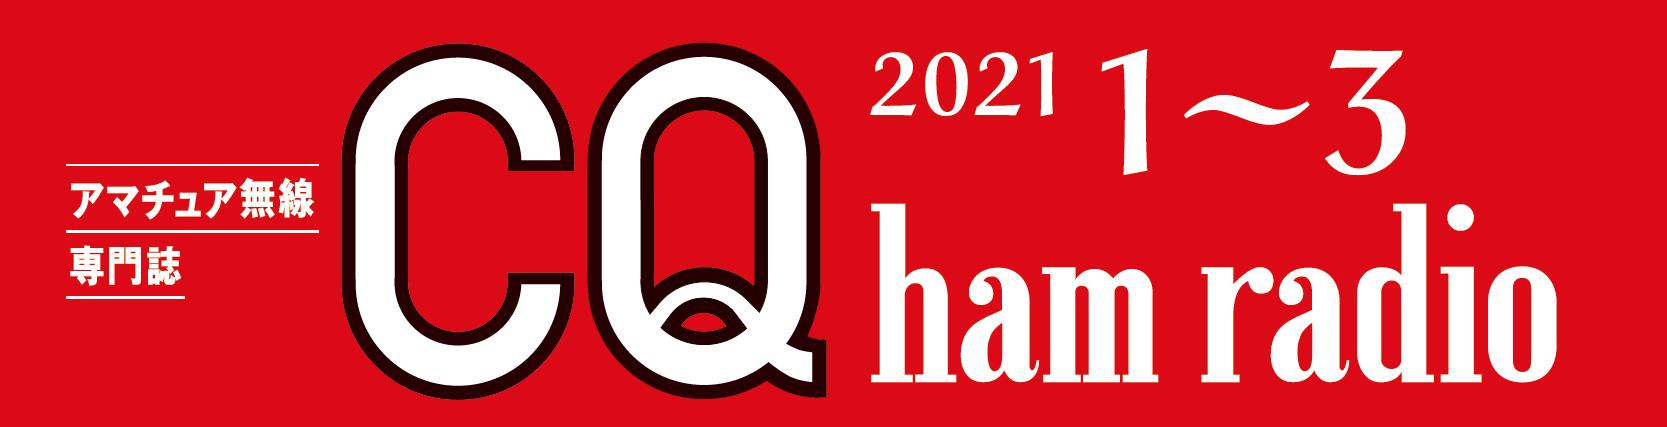 CQ ham radio 2021年 1~3月号もくじ